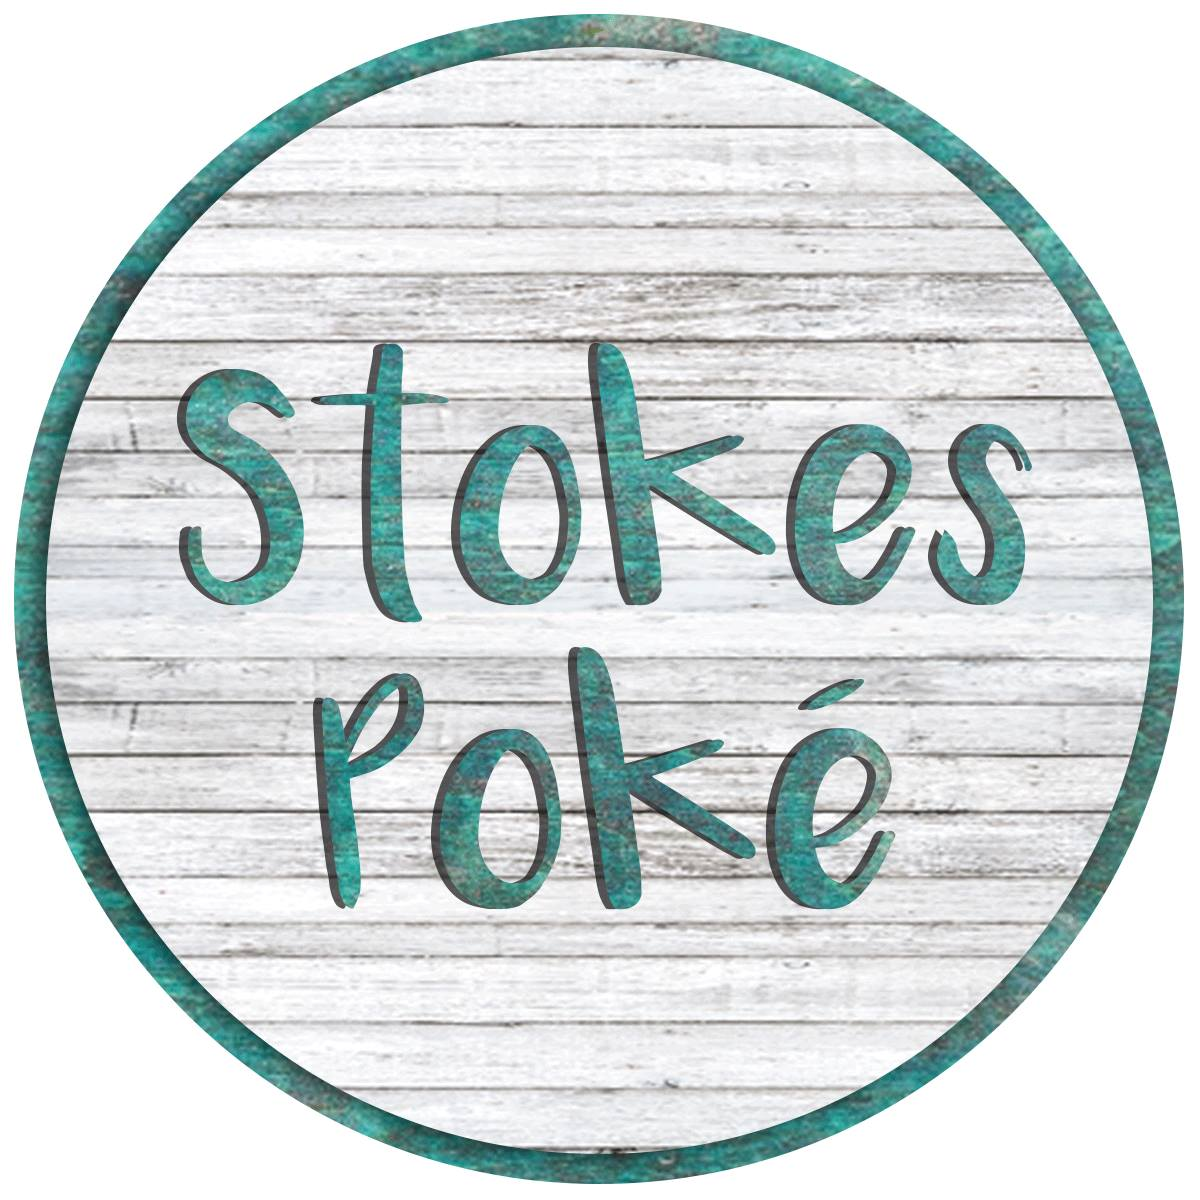 Stokes Poké logo